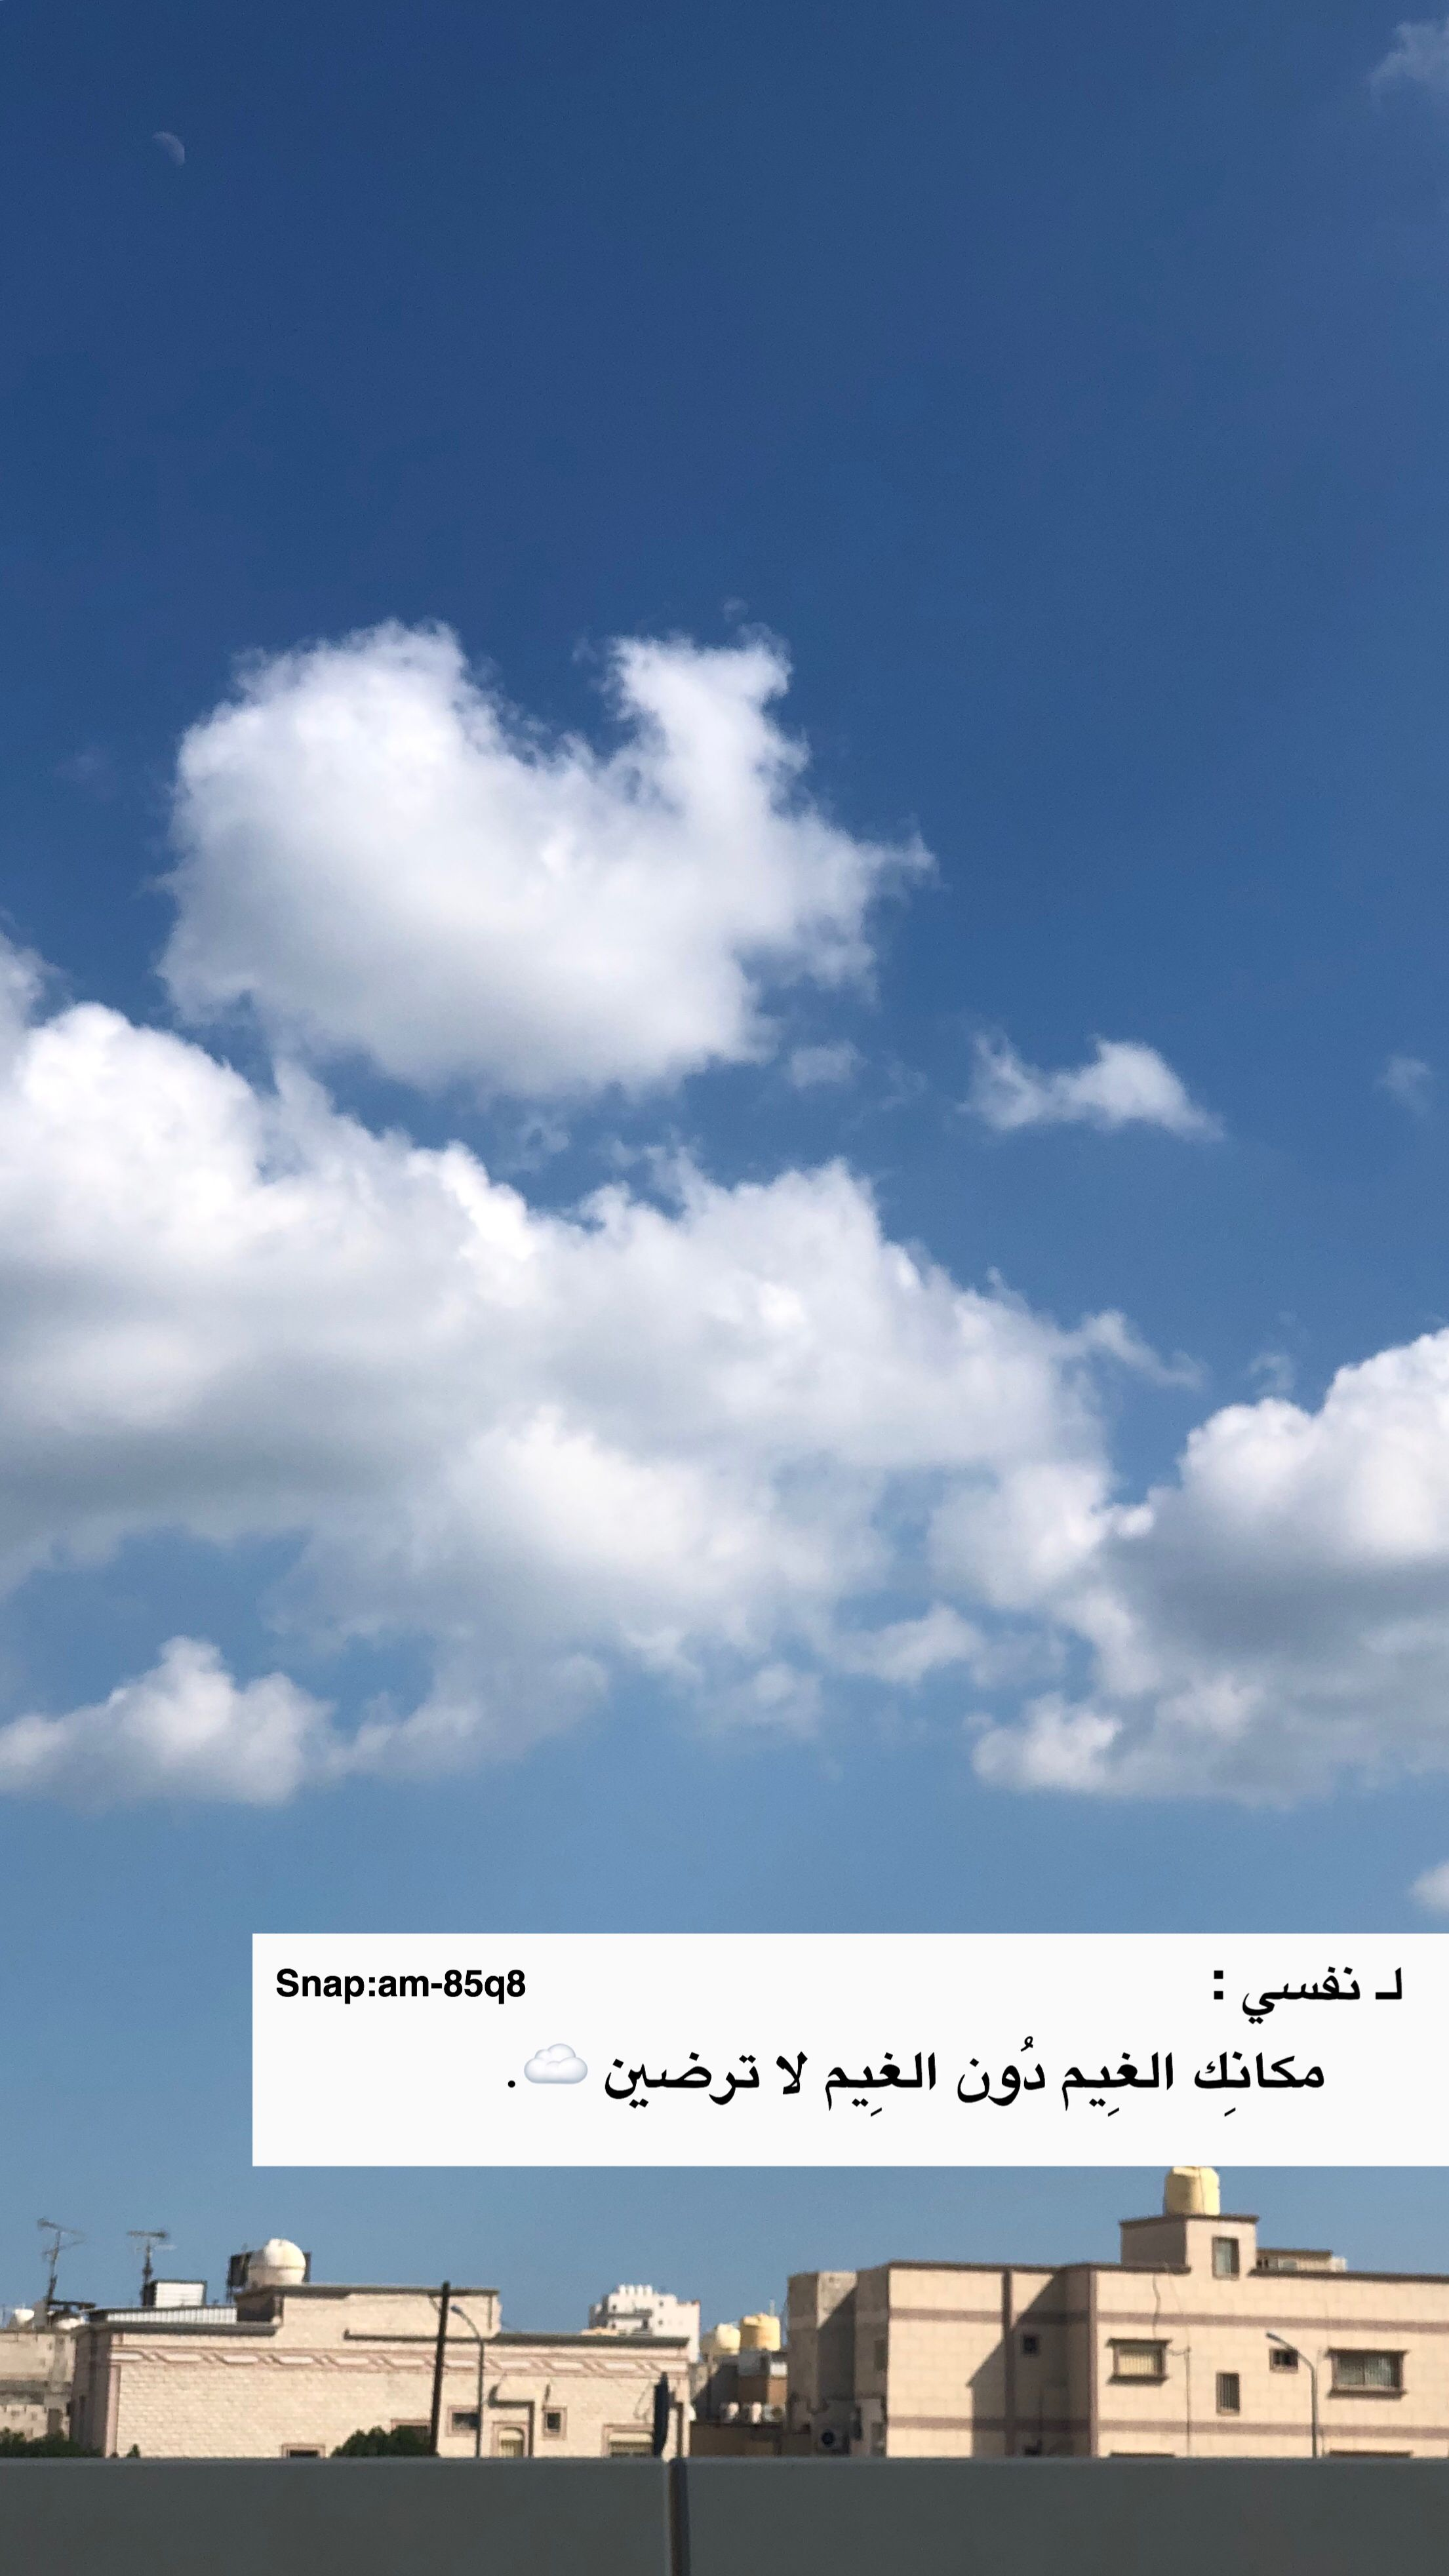 سنابات تصويري كل هالدنيا أماني Beautiful Arabic Words Islamic Quotes Wallpaper Photo Quotes